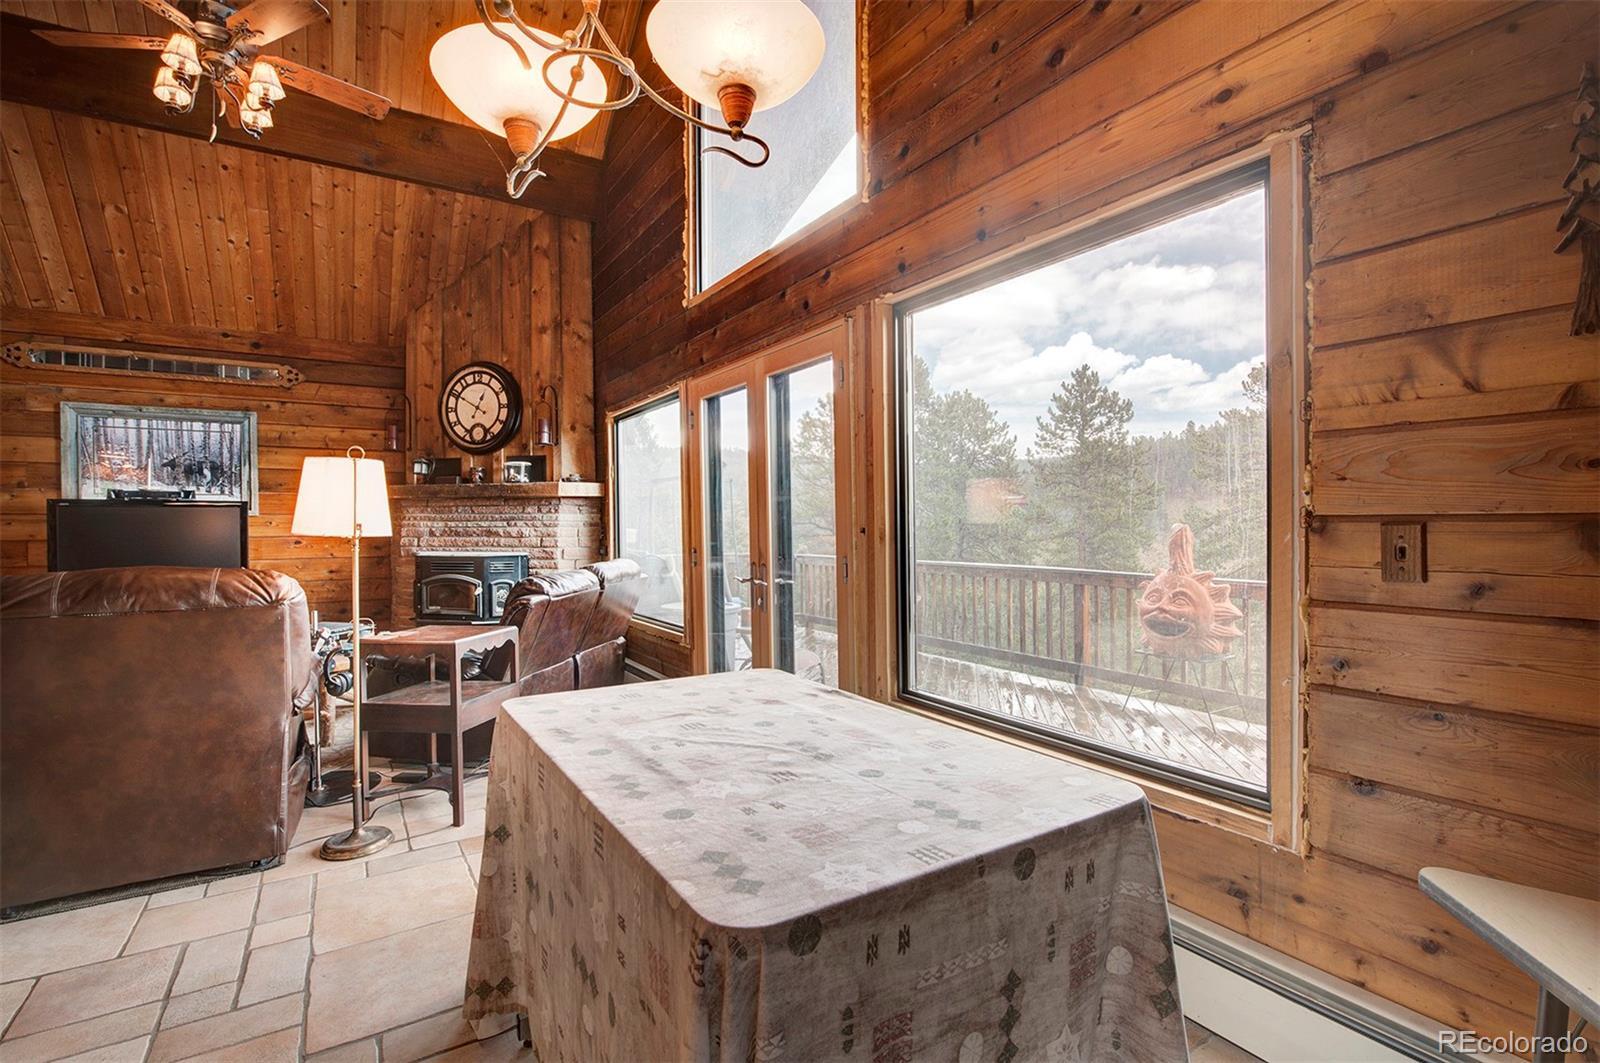 MLS# 6922377 - 13 - 12123 Geronimo Trail, Conifer, CO 80433